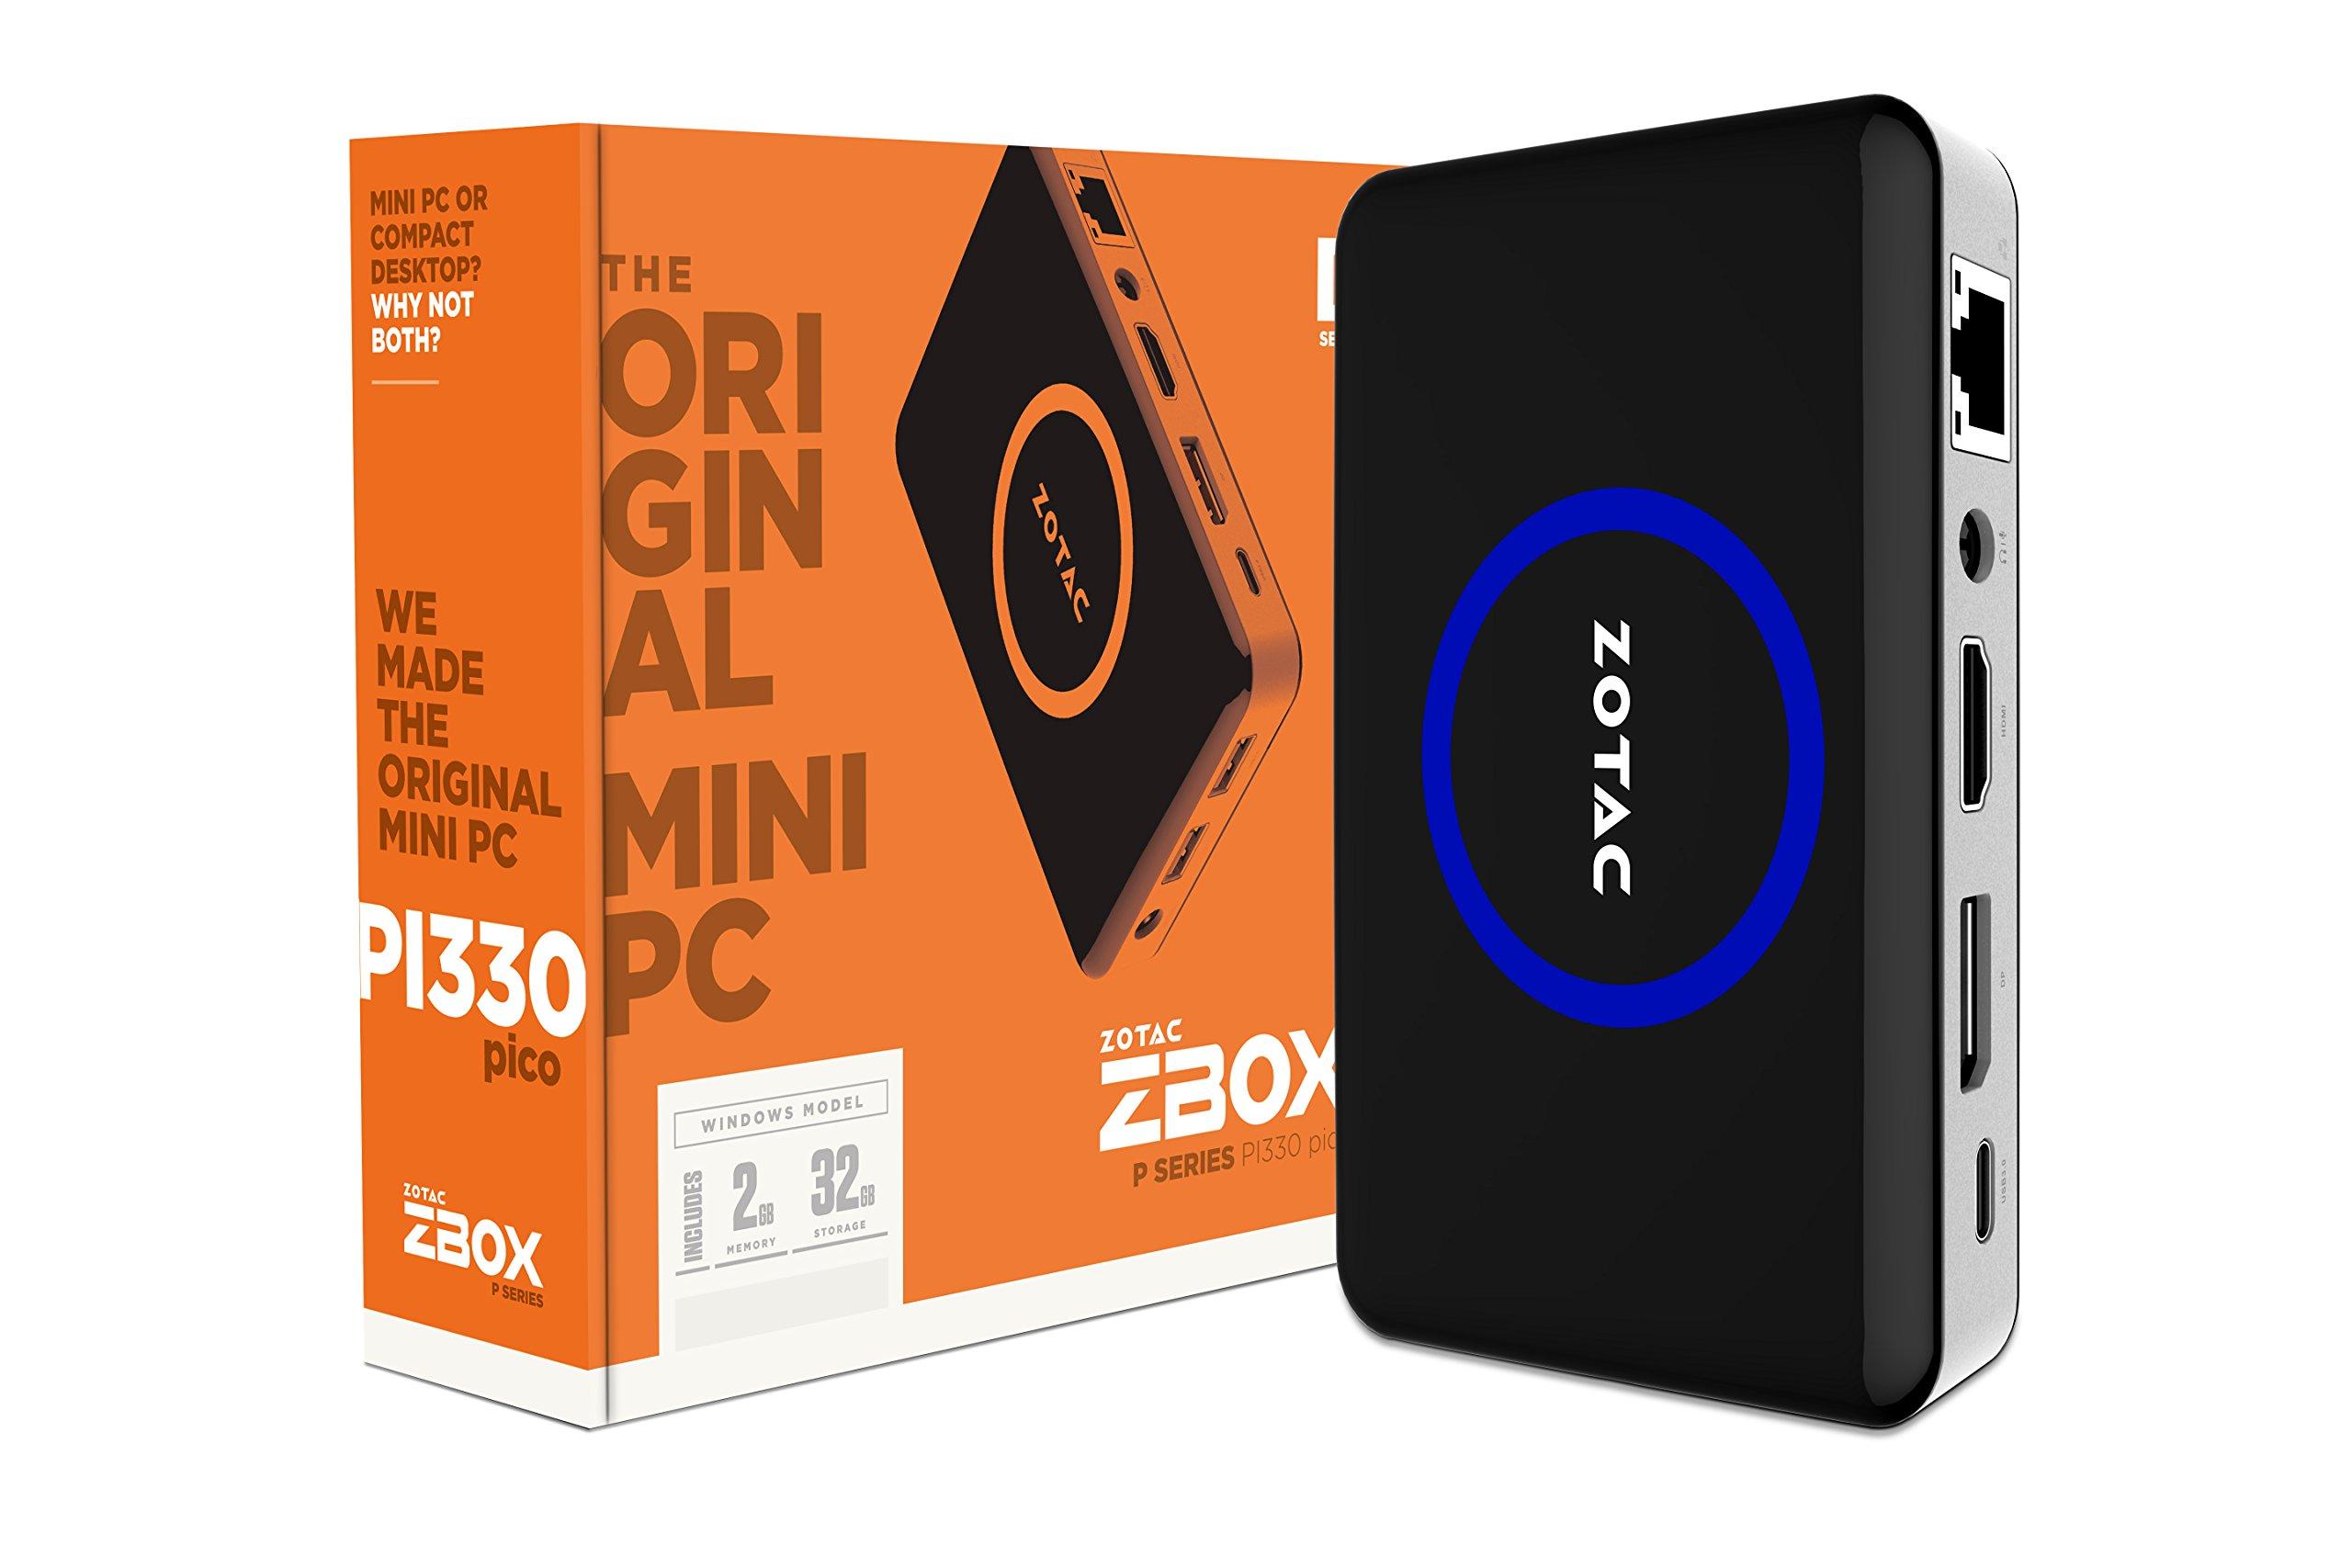 Zotac ZBOX-PI330-W2B Intel Atom x5-Z8500 1.44GHz/ 2GB LPDDR3/ 32GB emcee/ No ODD/ Windows 10 Home Mini PC